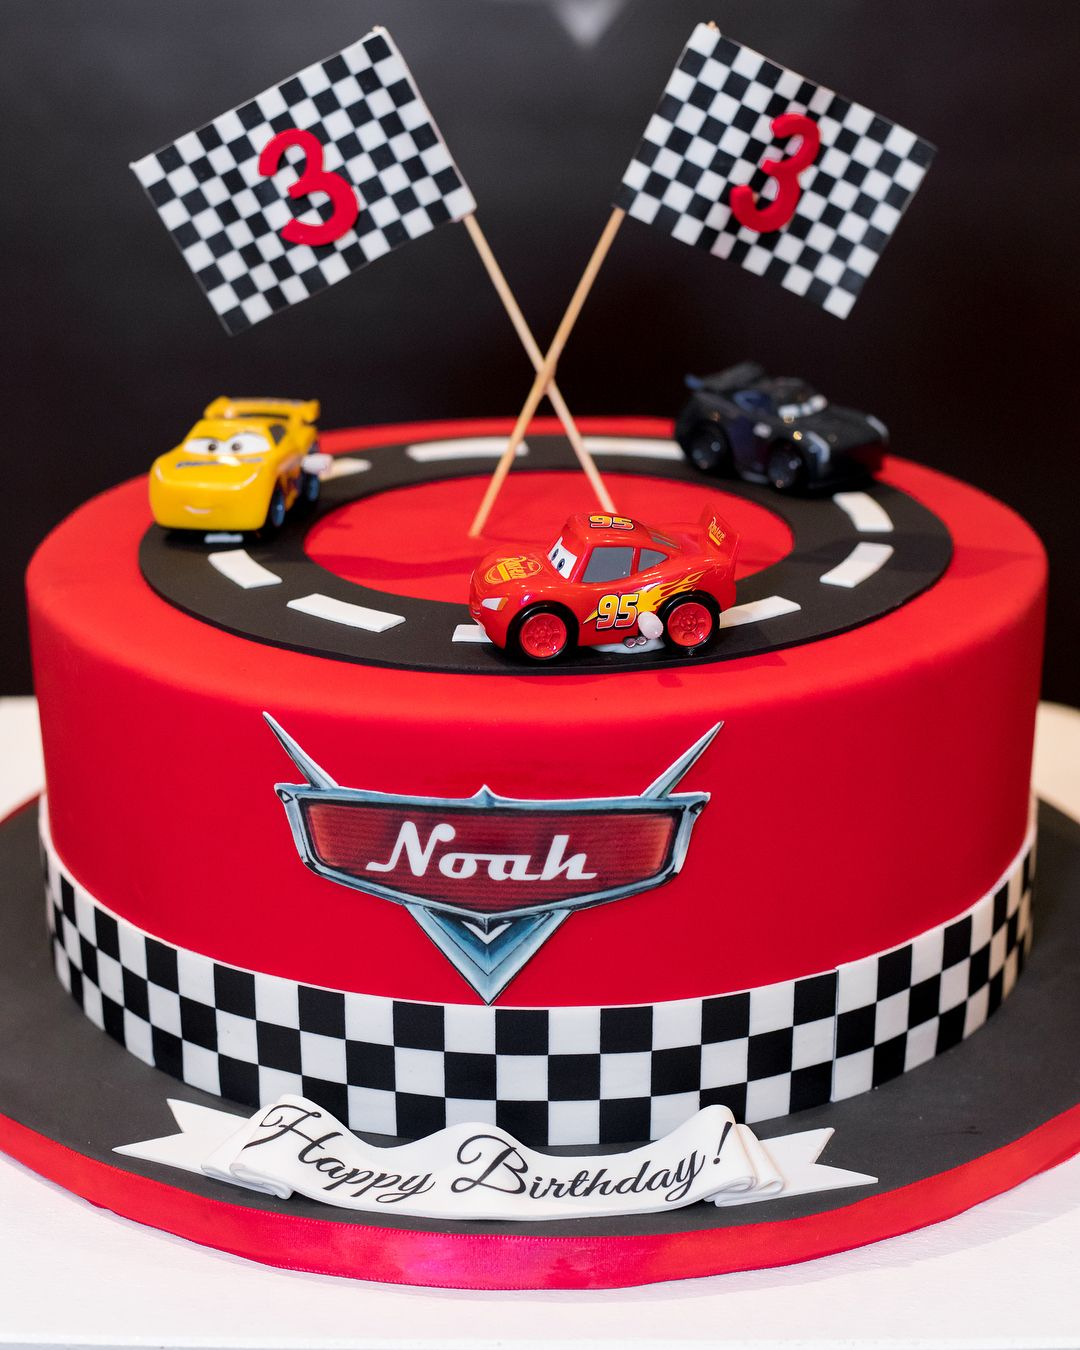 57 Fiesta Joaquin Ideas Cars Birthday Parties Cars Birthday Cars Theme Birthday Party